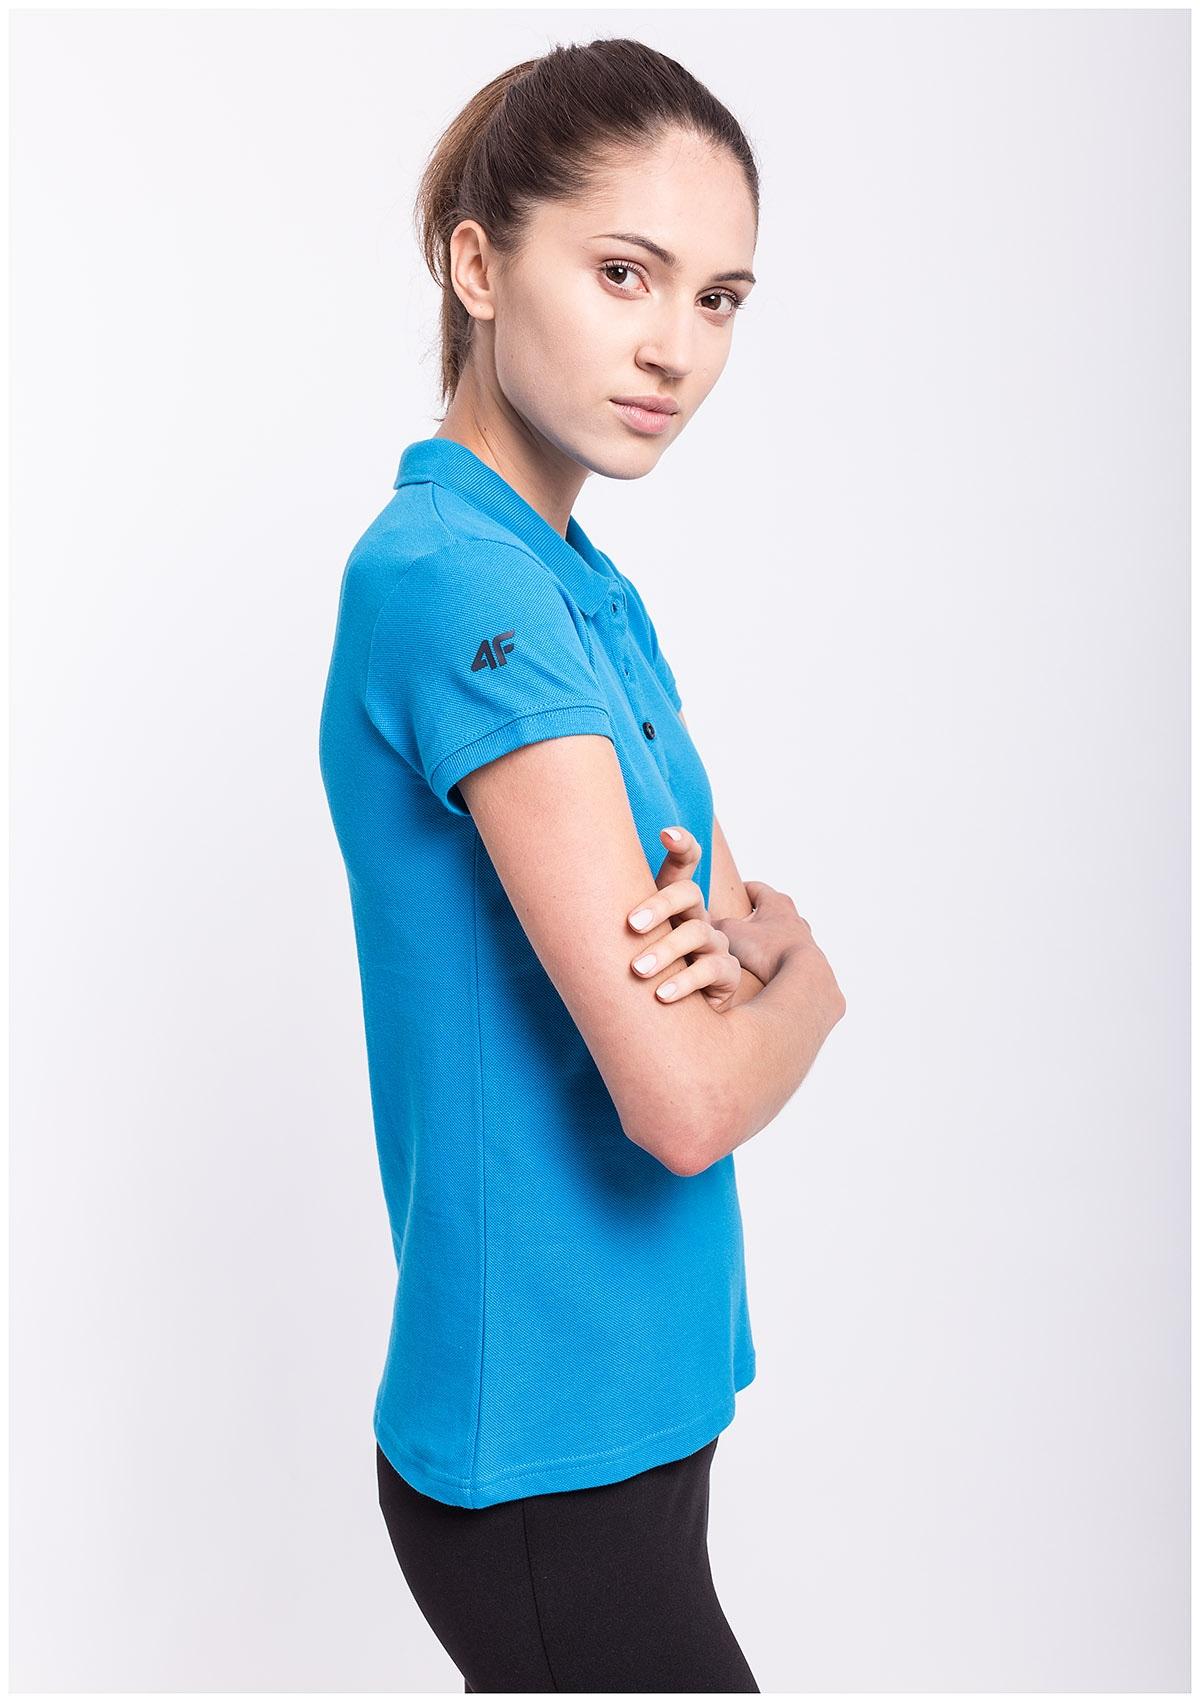 Koszulka polo damska TSD051 - niebieski jasny